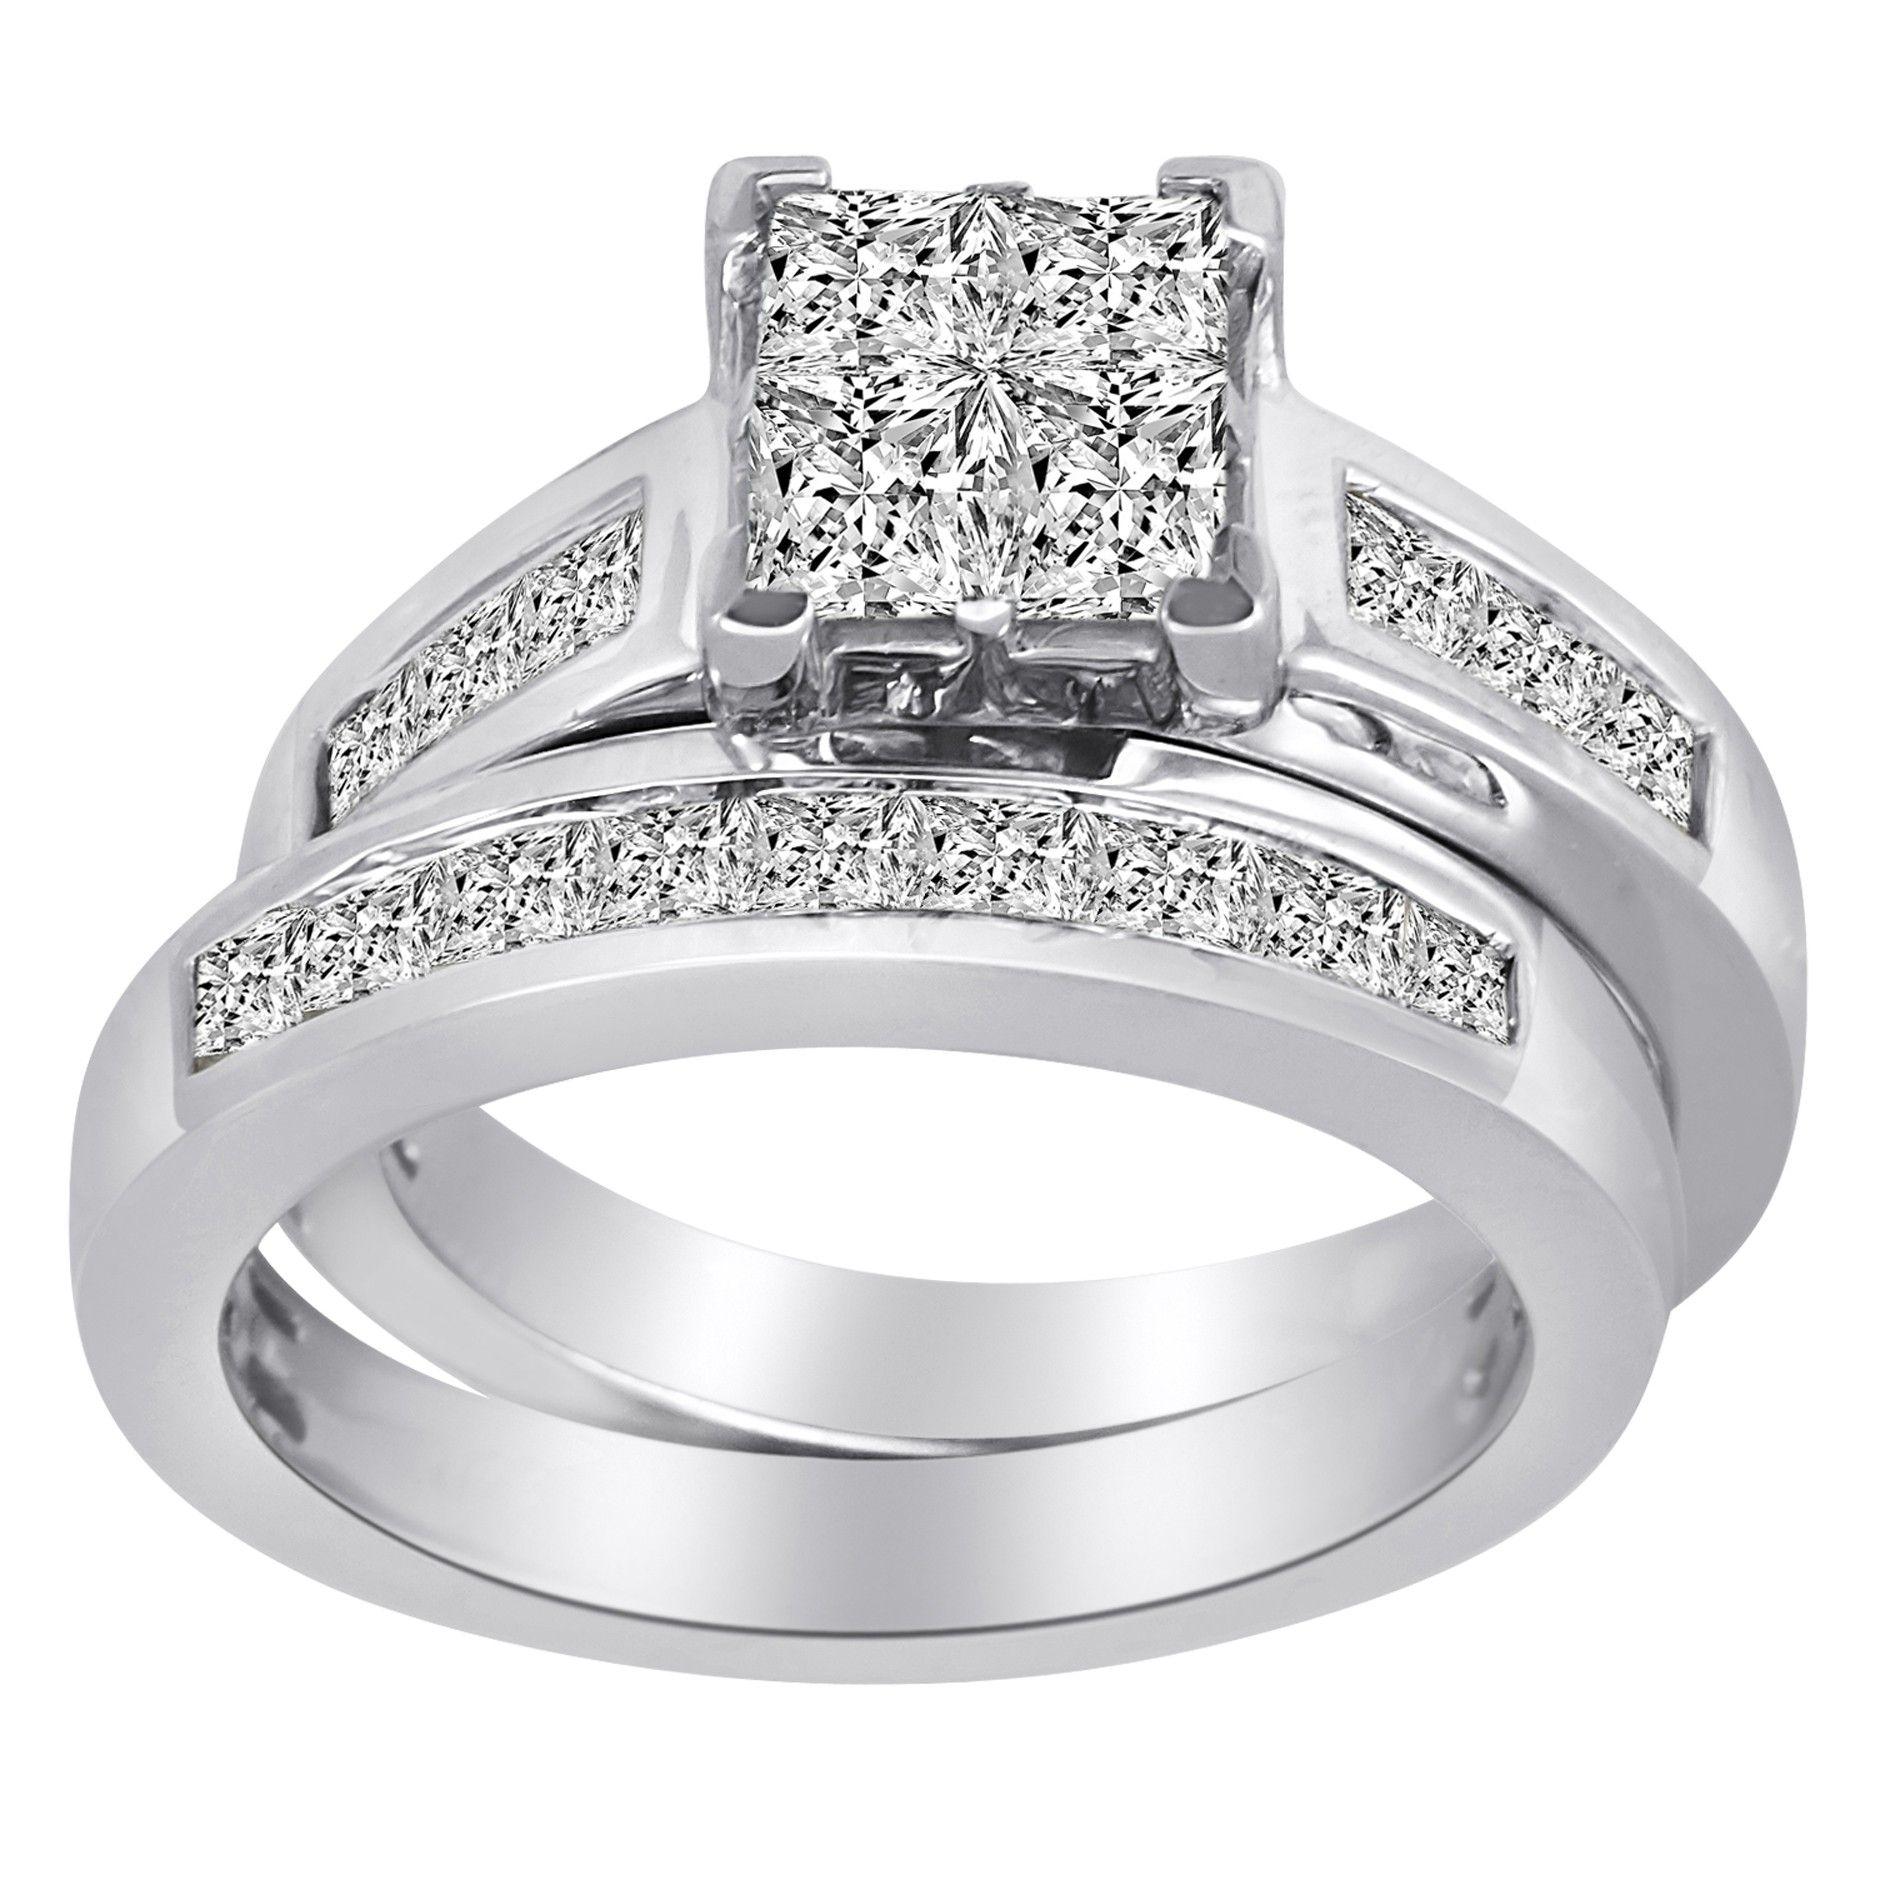 Pin by Engagement - Wedding on Jewelry Palladium engagement